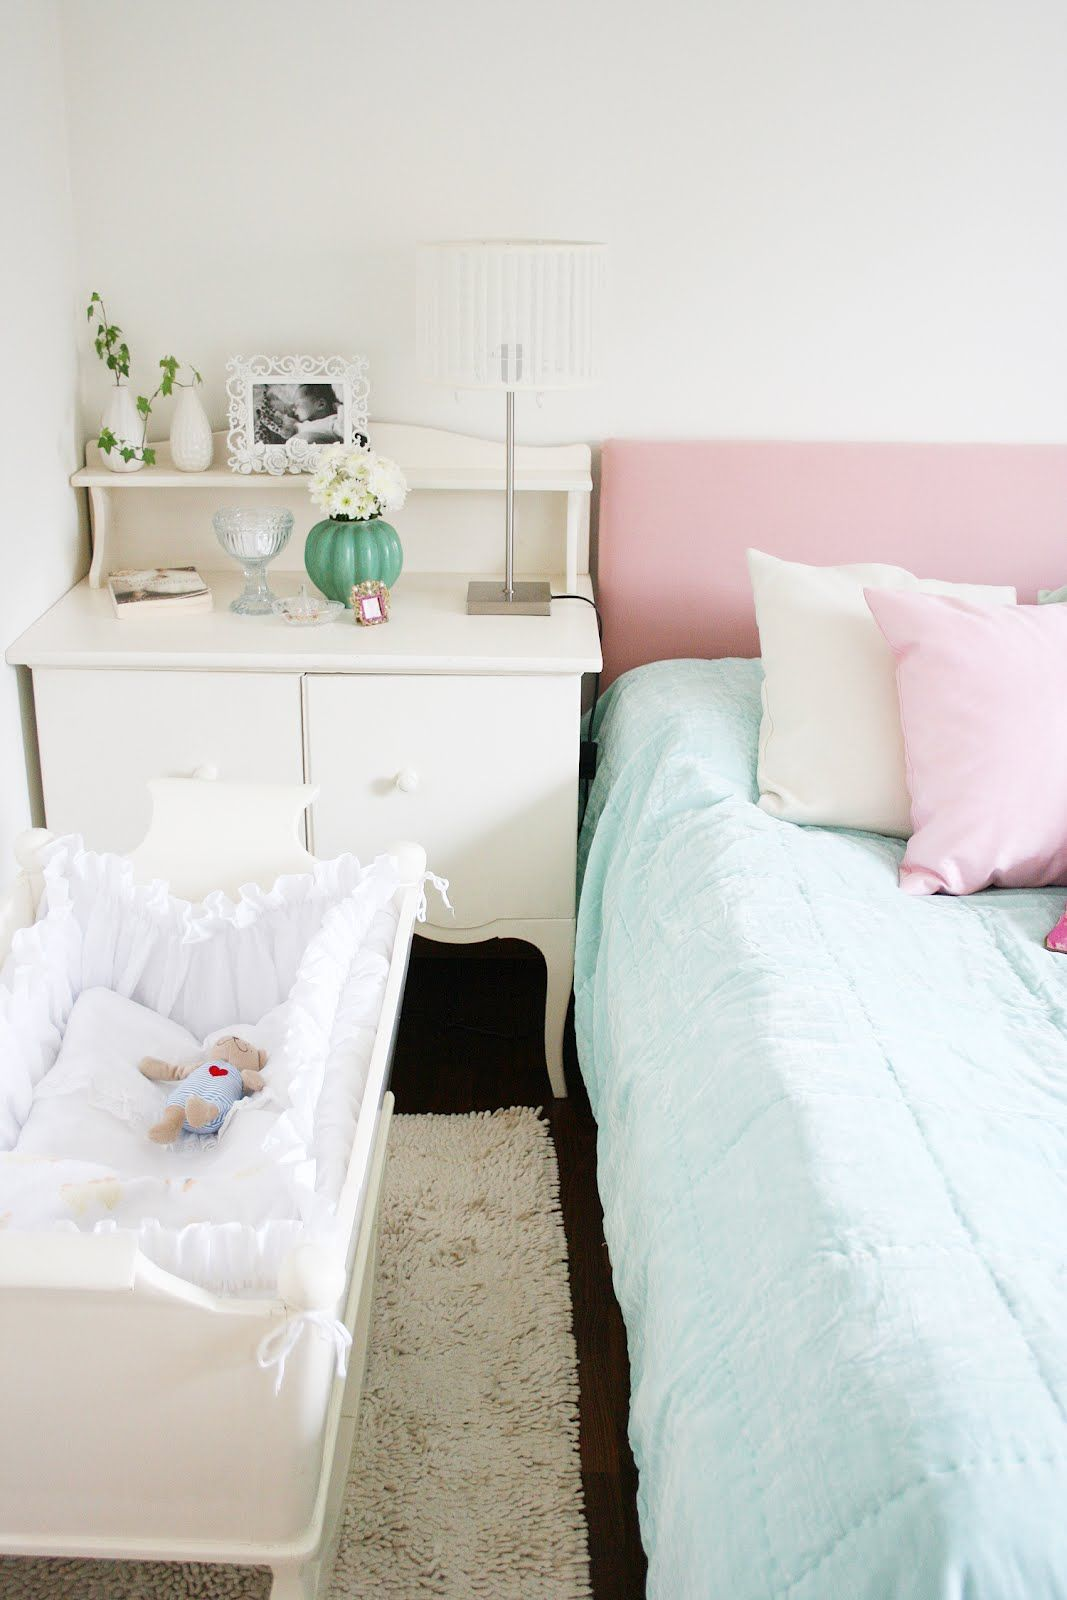 Pin by Petra Hanna Gabriella on Vackert! | Home, Toddler ...